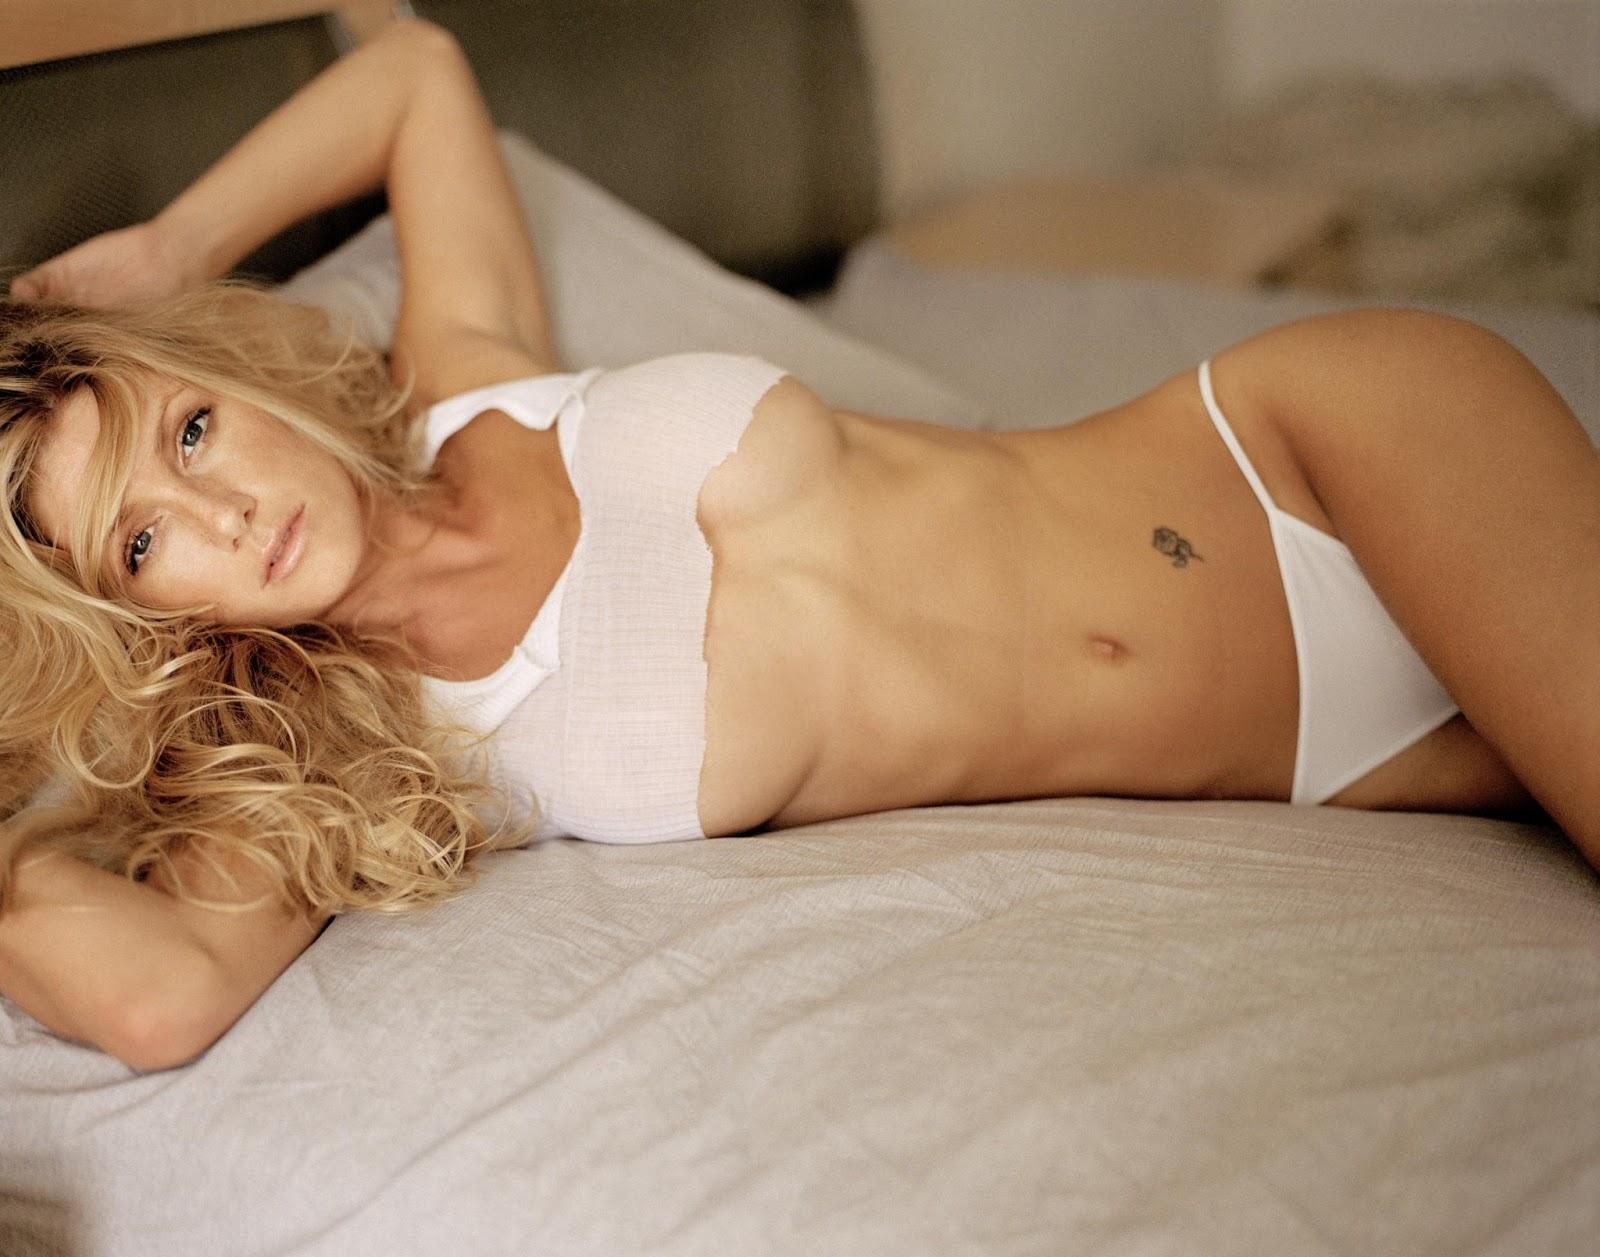 Brande Roderick Desnuda Topless